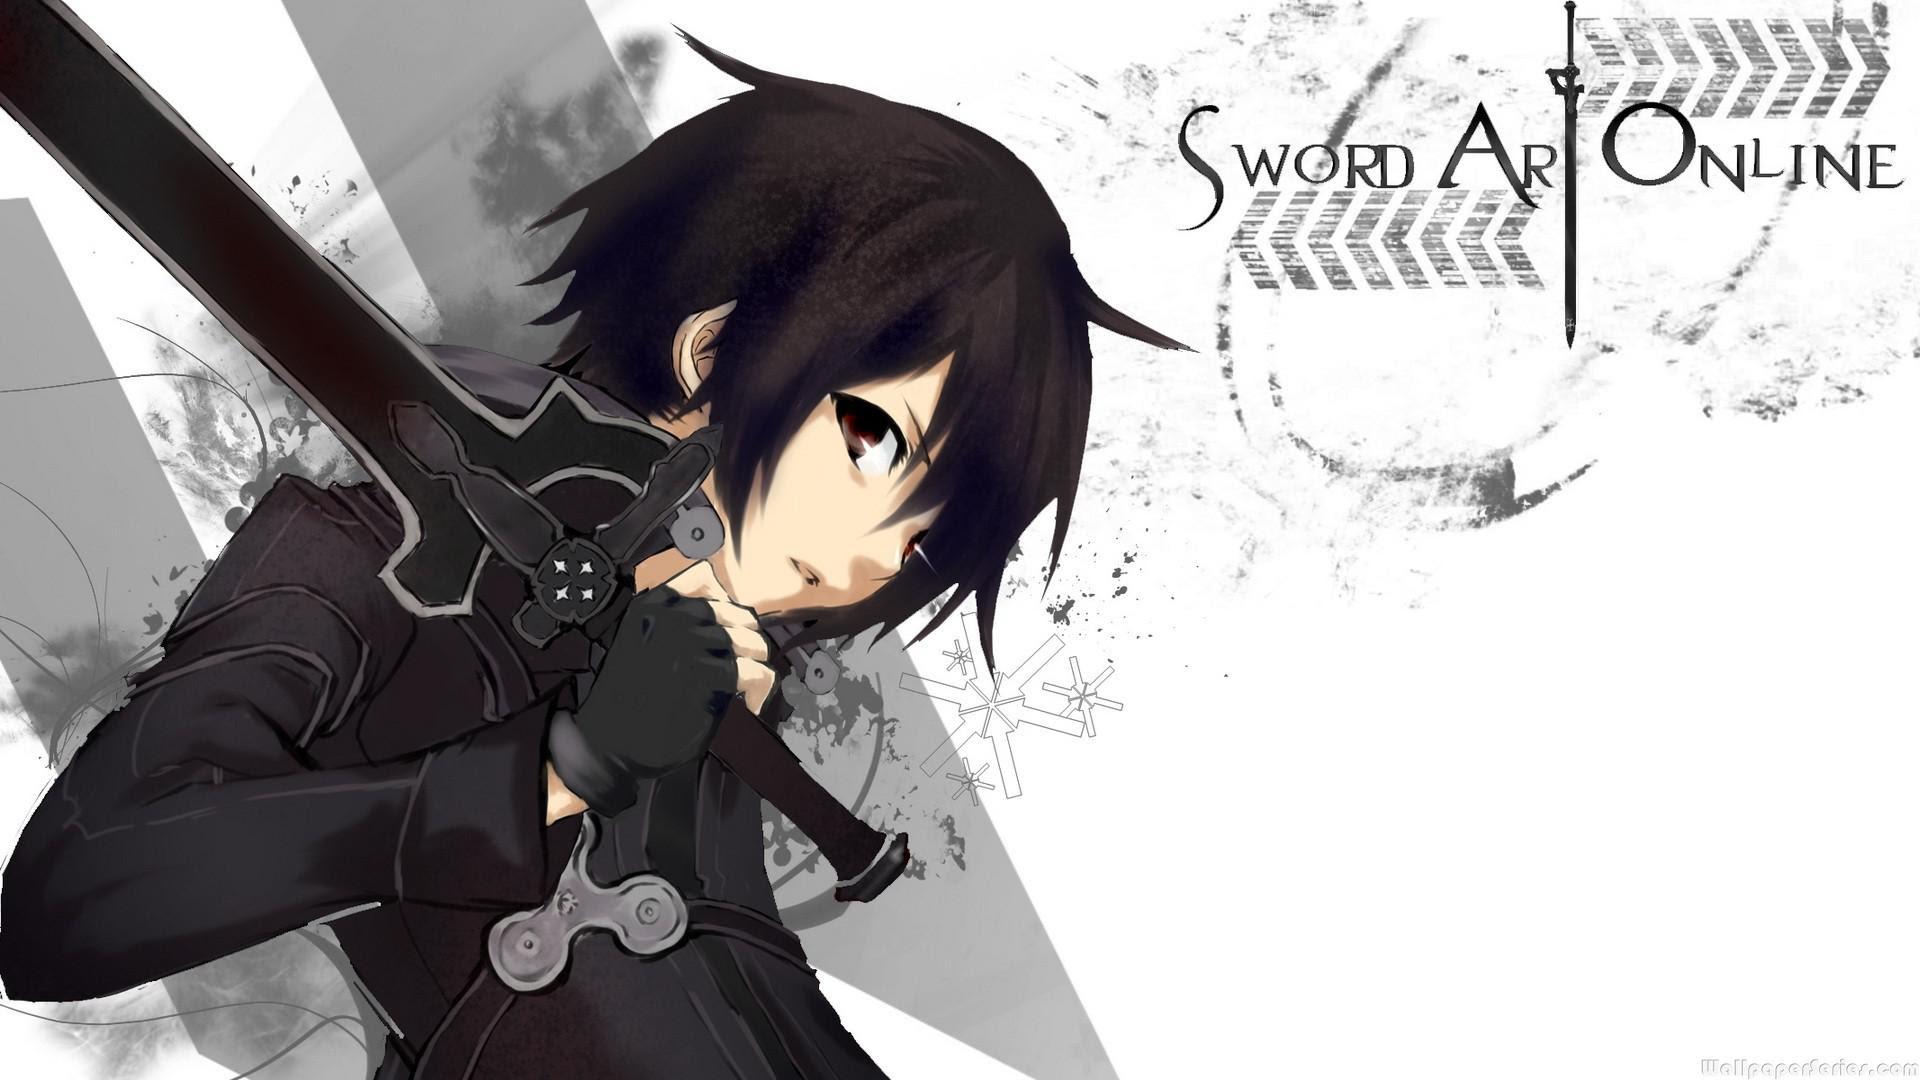 Hd Kirito Sword Art Online Wallpaper Download Free 139276